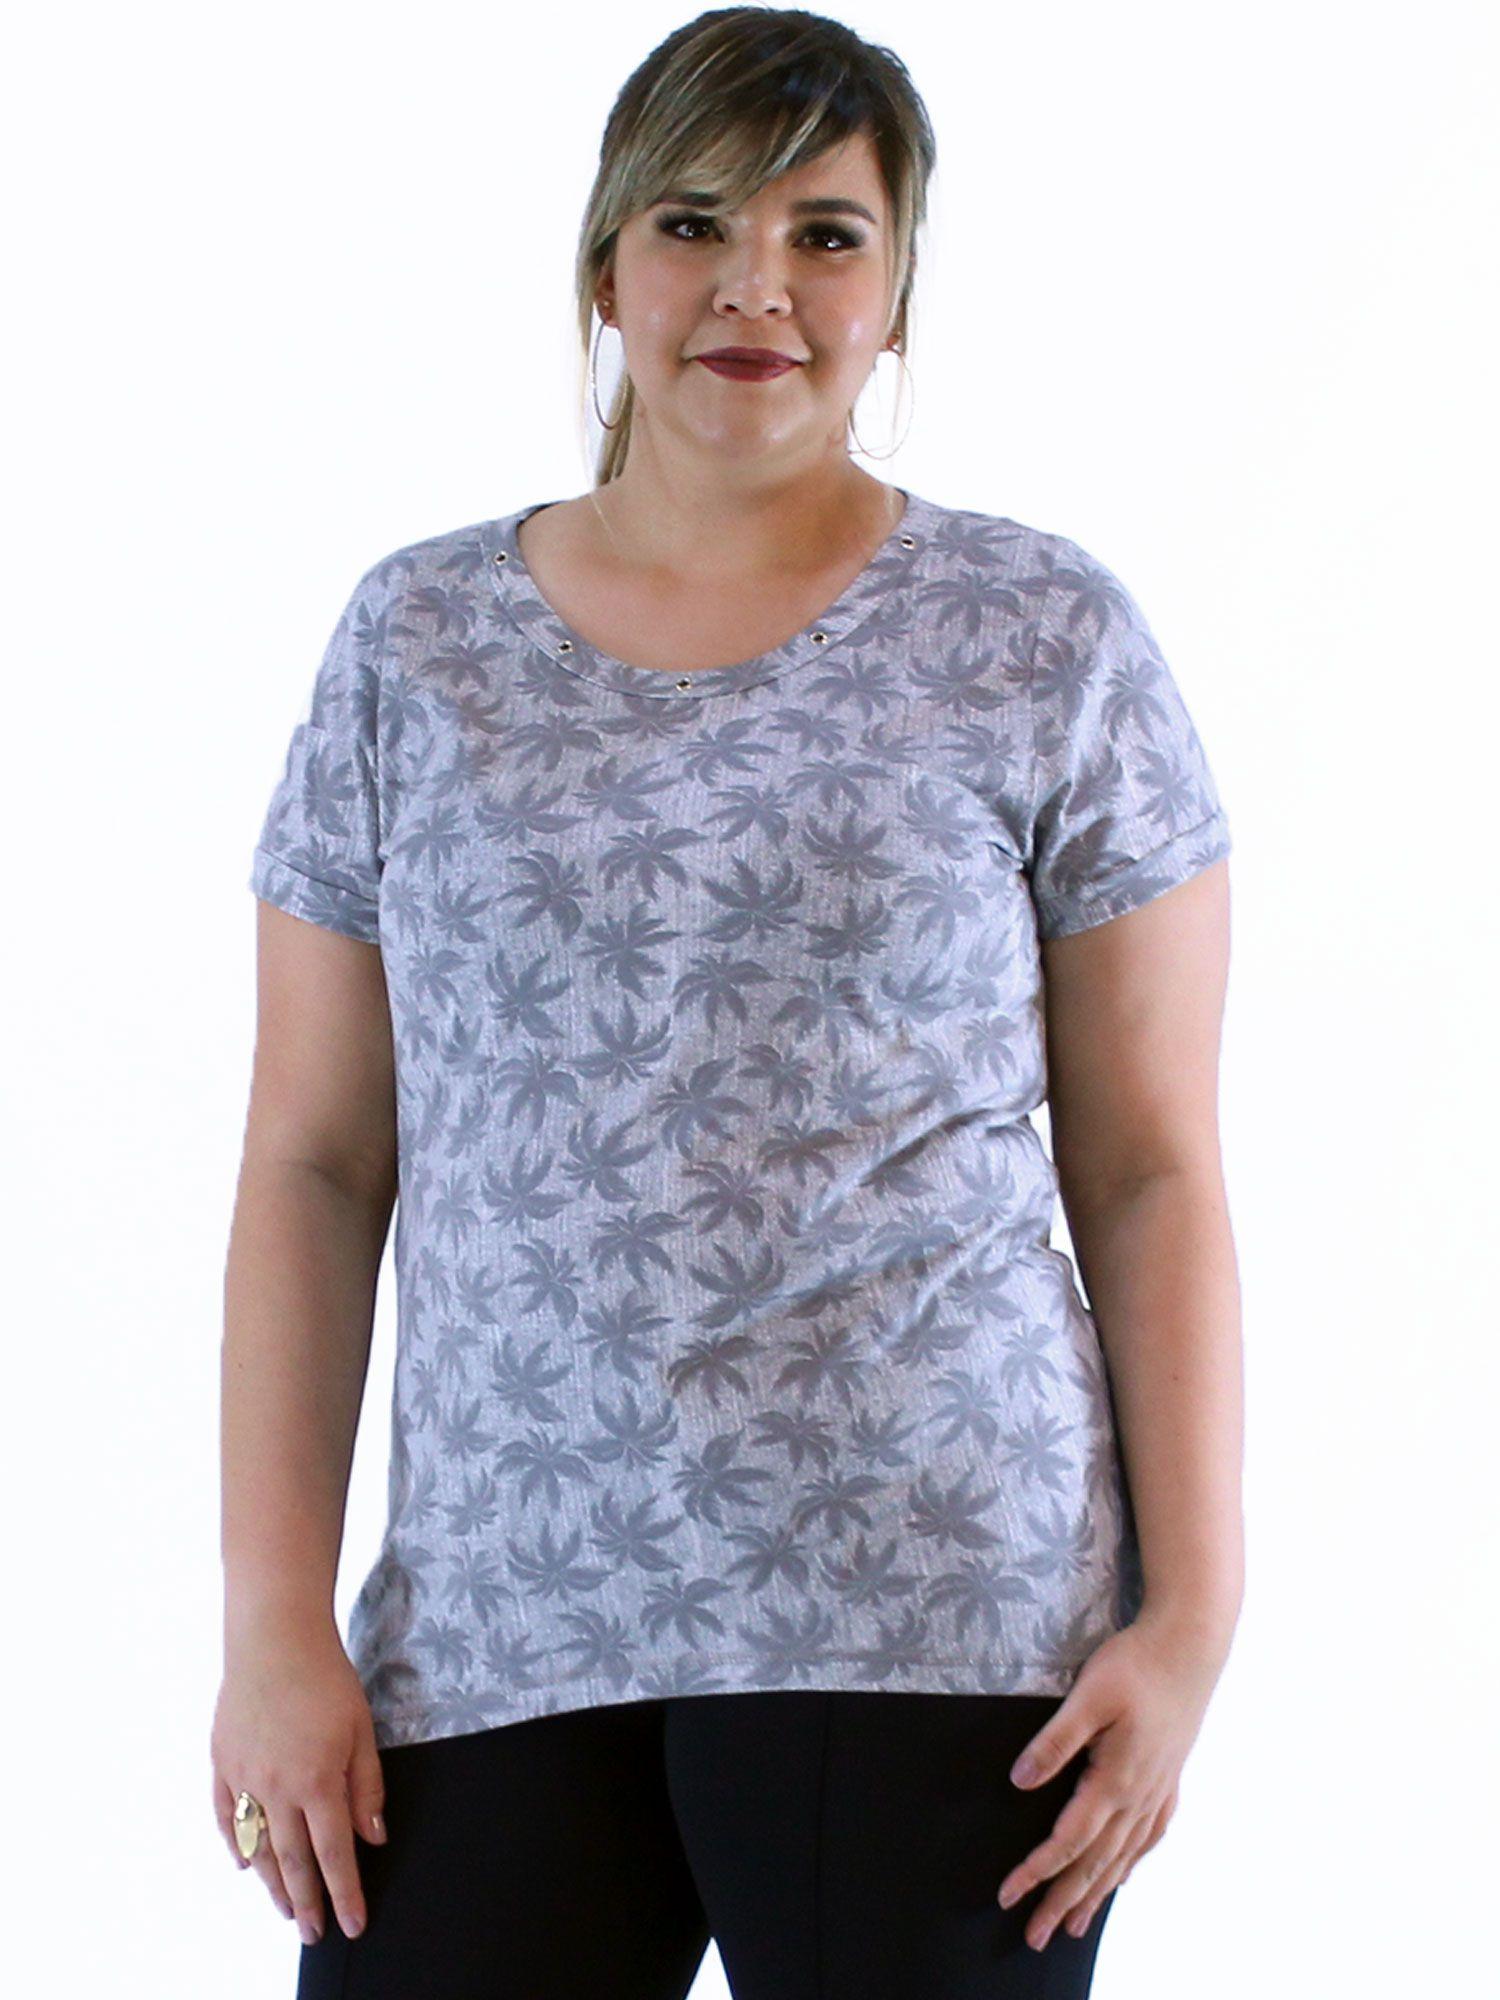 Blusa Plus Size KTS Decote Aberto com Ilhós Cinza